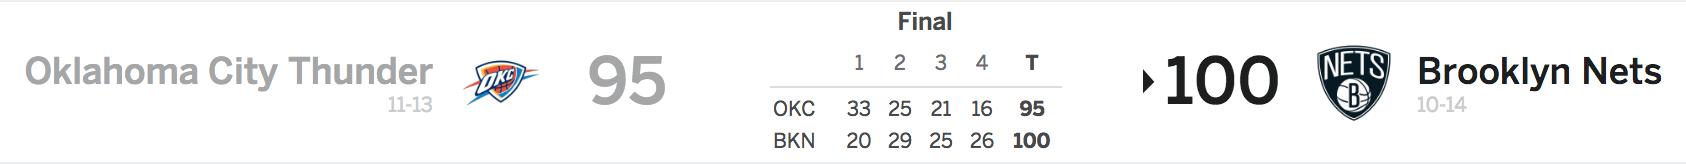 Nets vs Thunder 12-7-17 Score